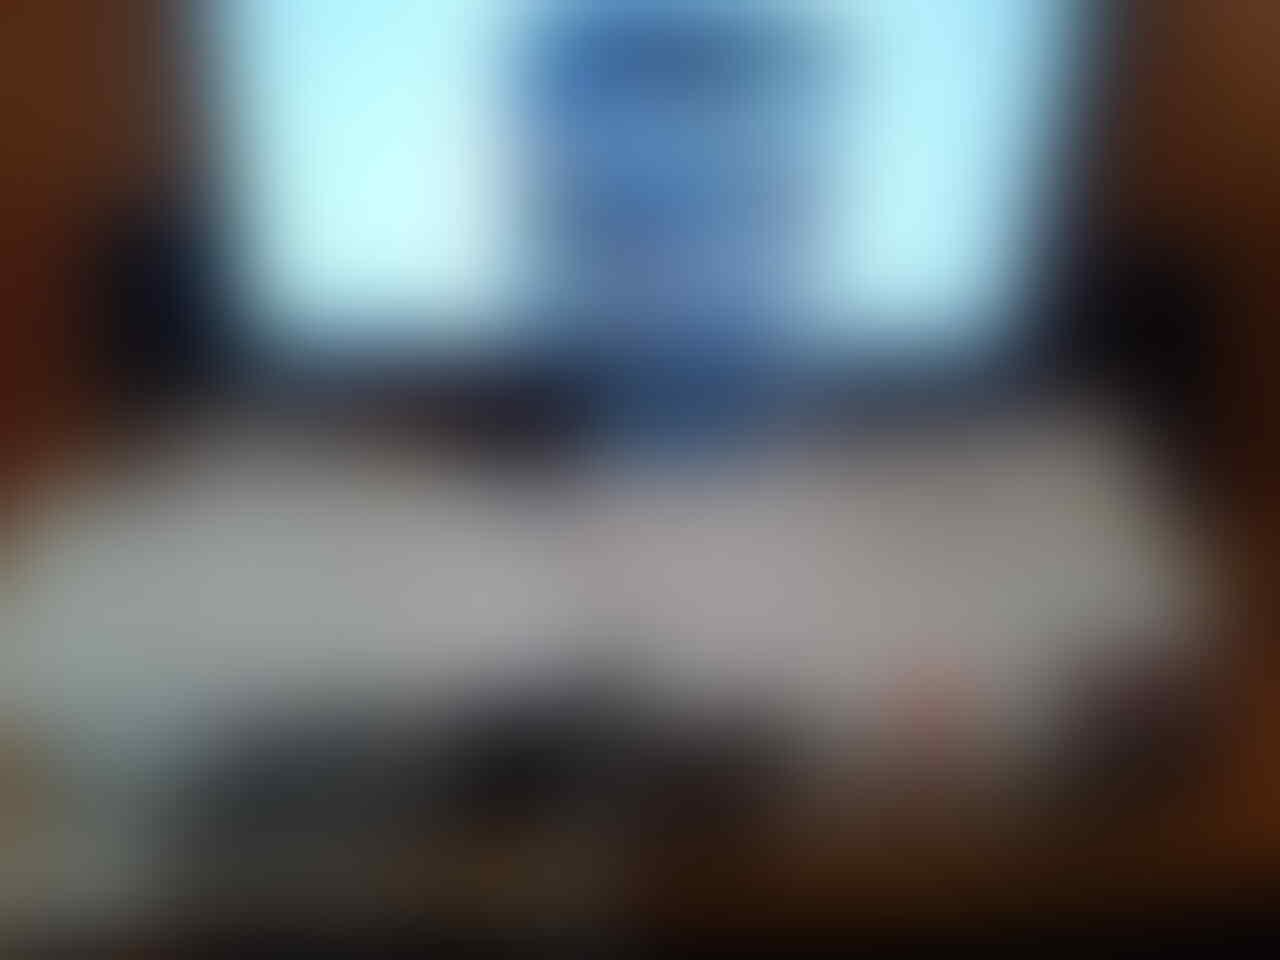 Jasa Isi Hardisk Game PC - Film HD - 3D (COD Kalimalang Jakarta Timur)